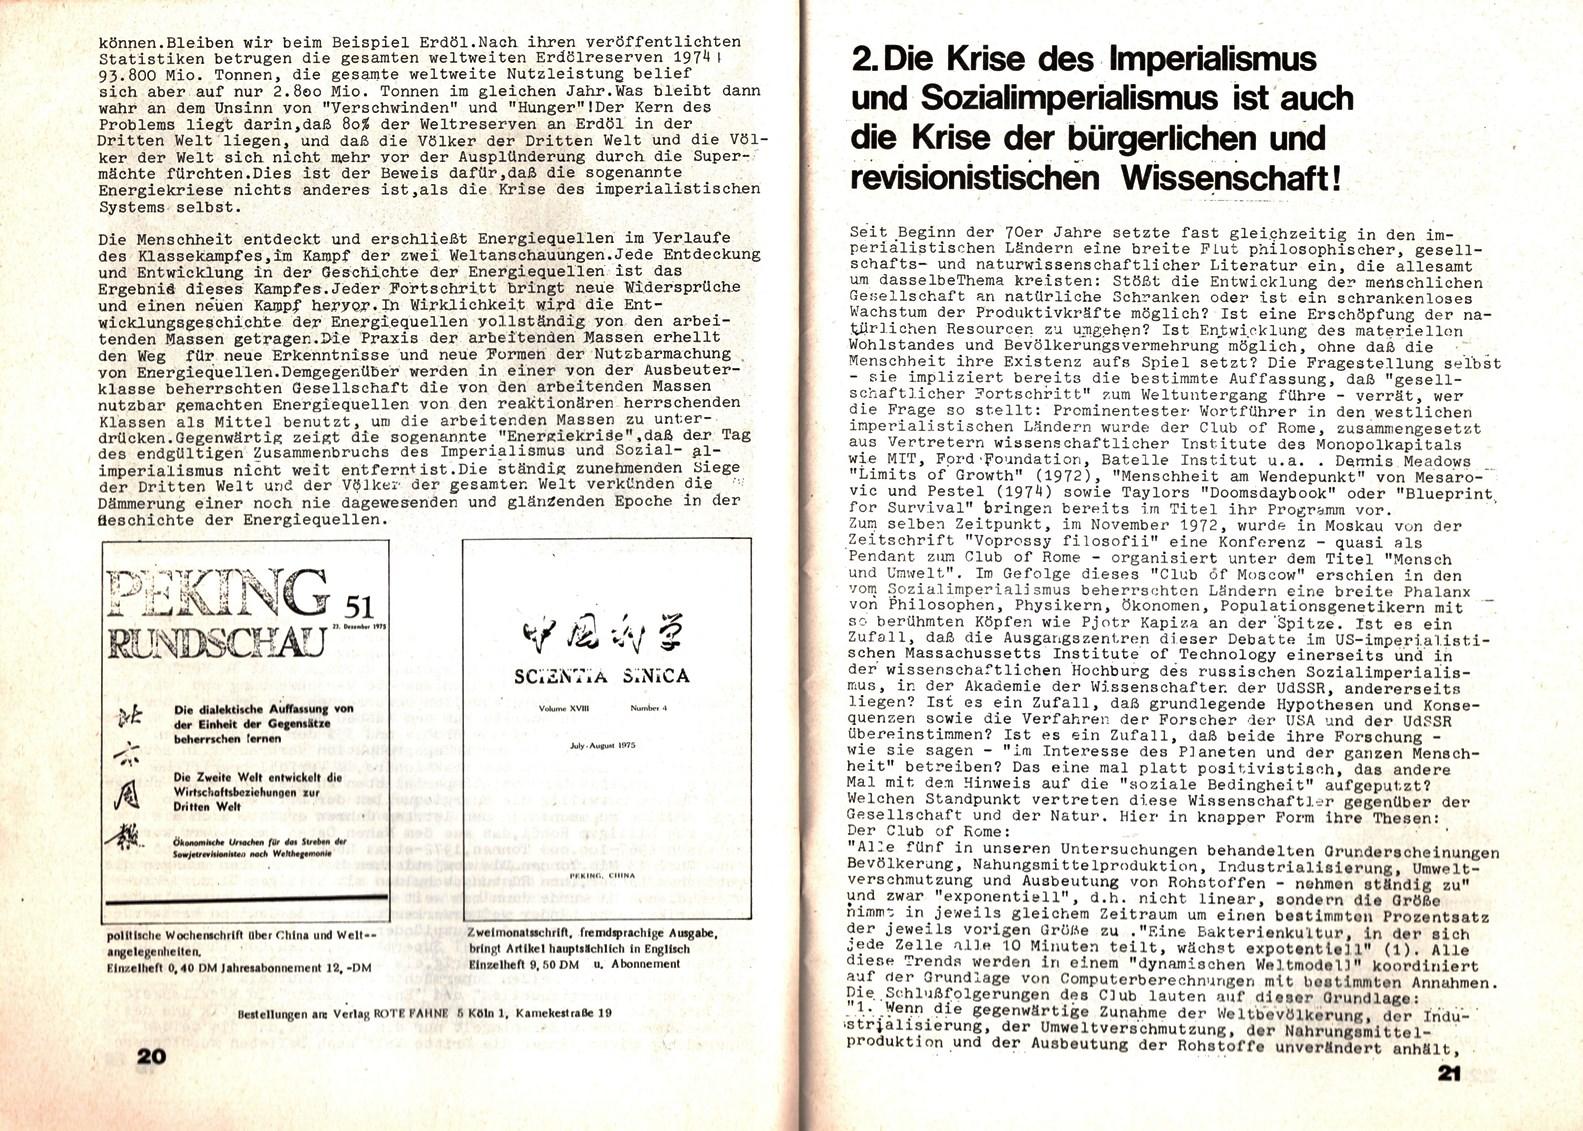 KSV_1976_Atomenergie_im_Kapitalismus_012